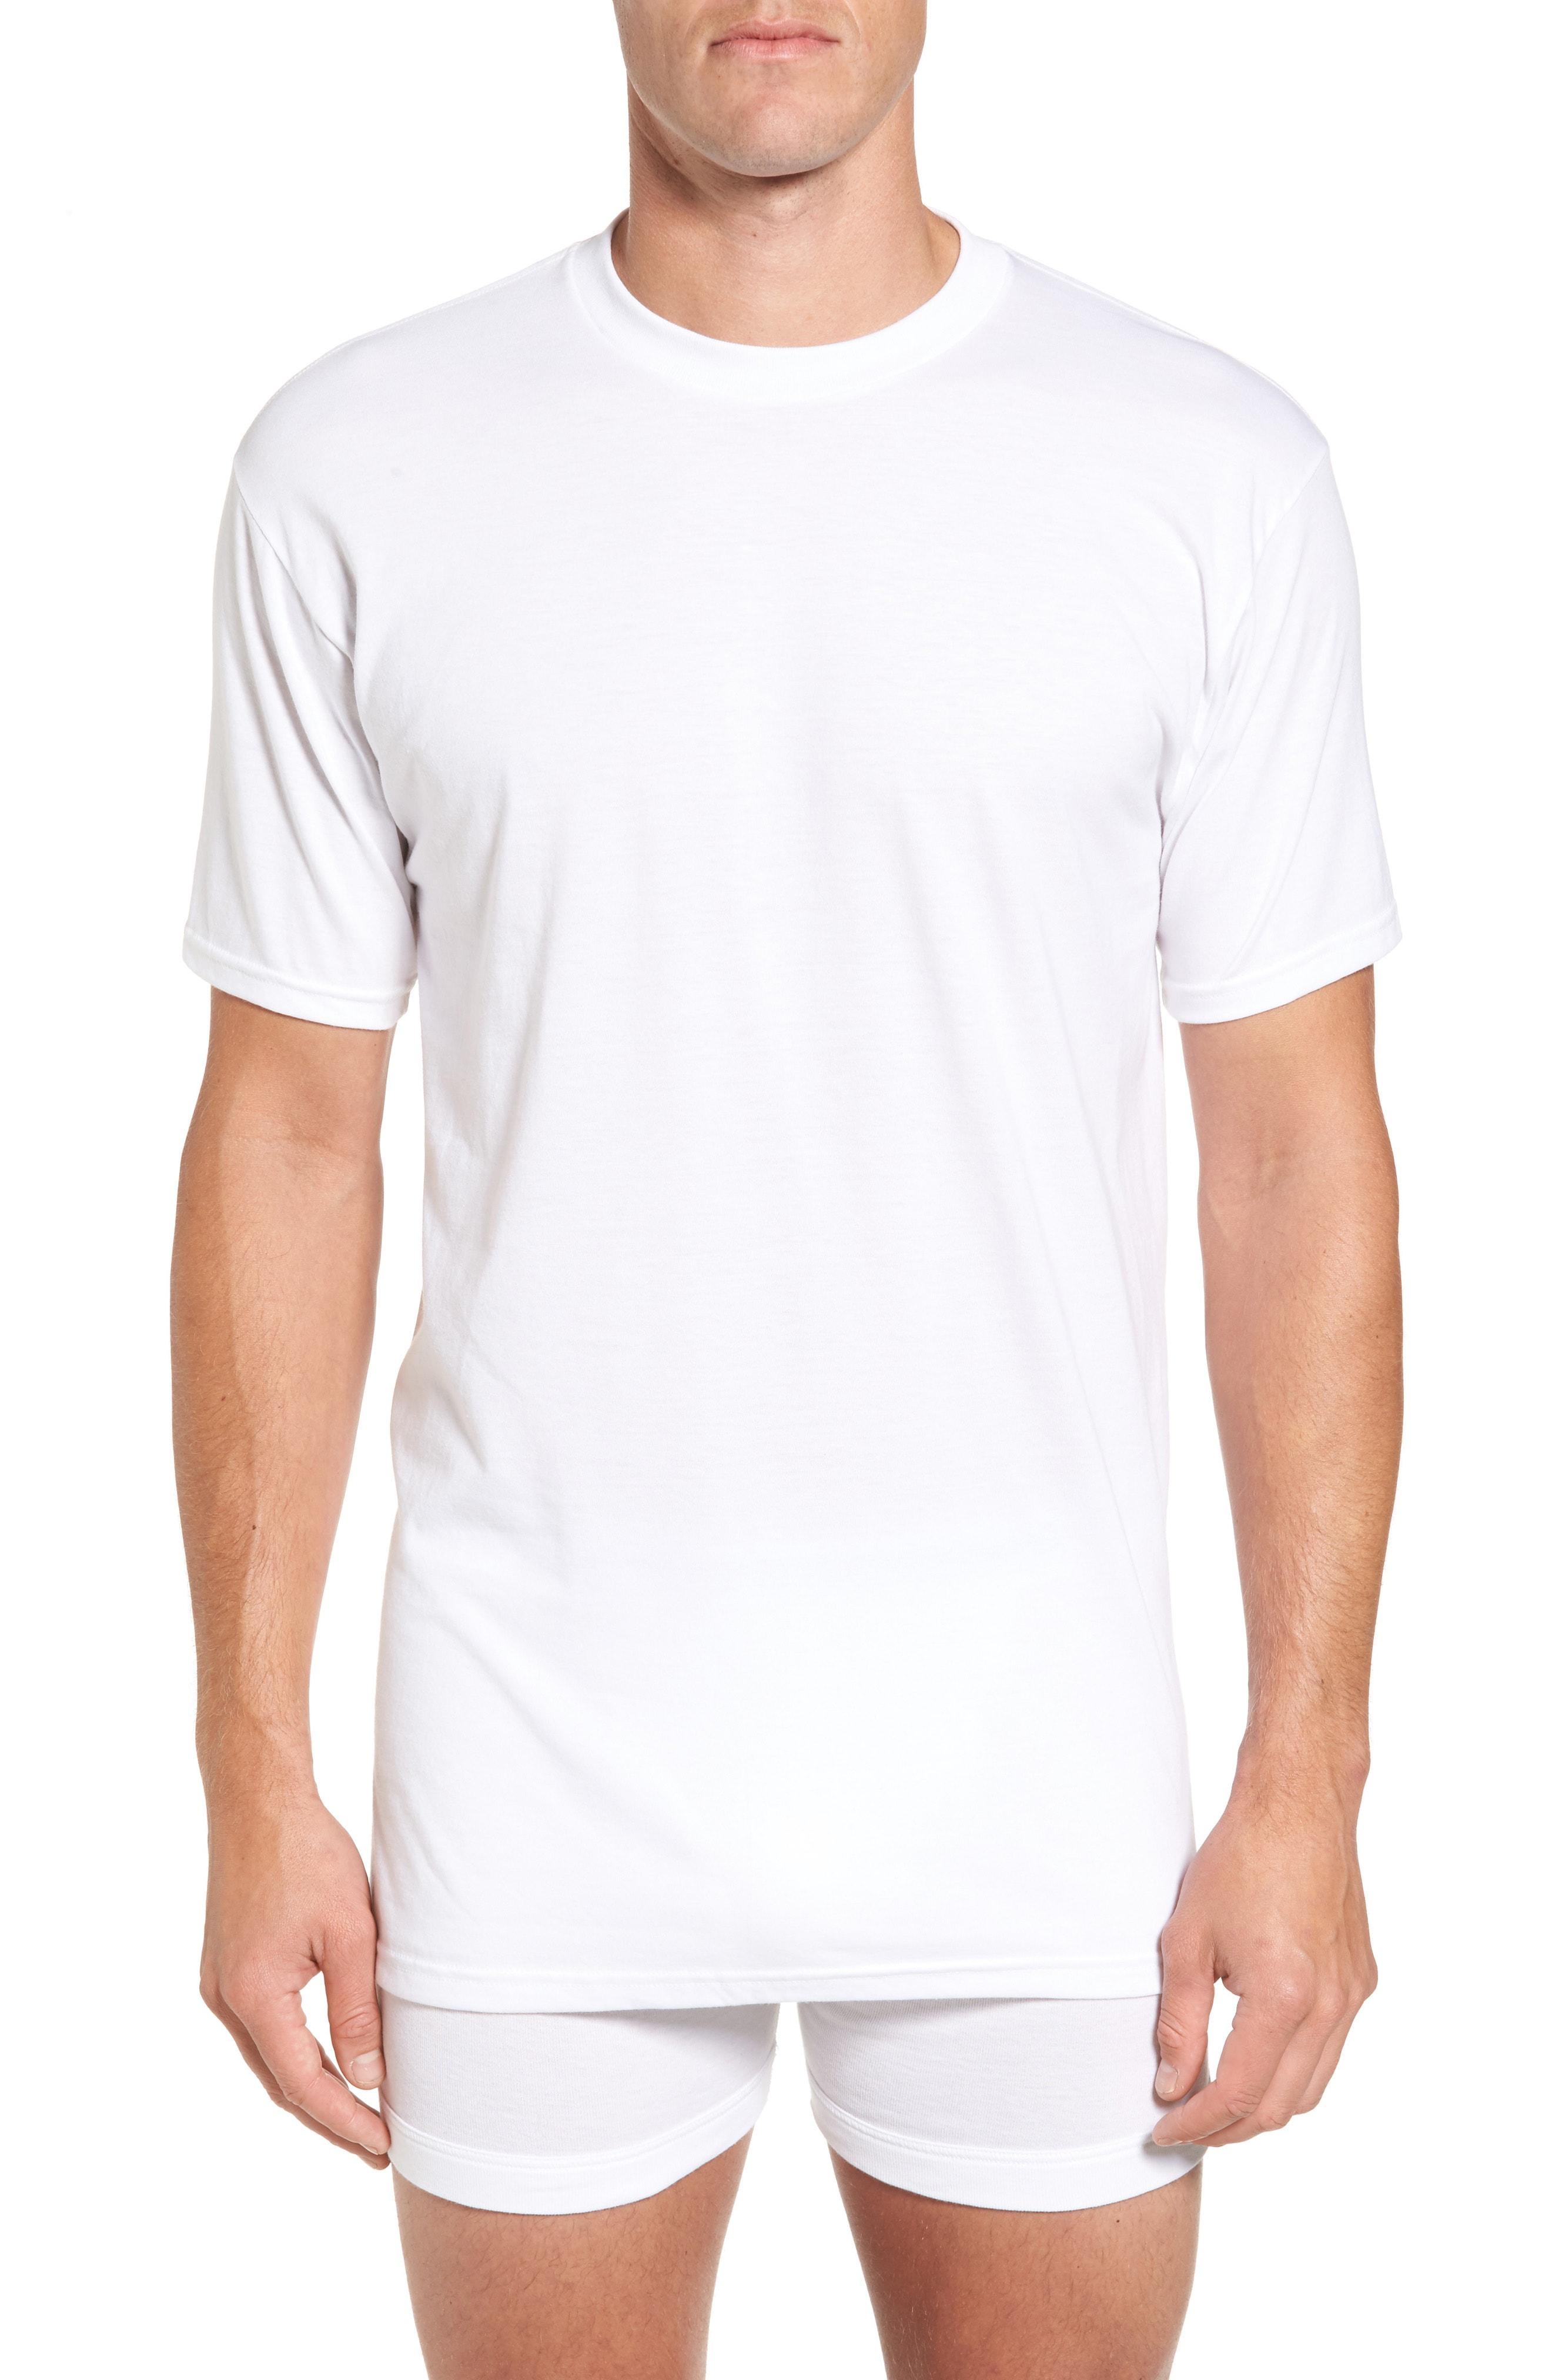 Nordstrom Men's Shop Regular Fit 4-Pack Supima Cotton T-Shirts